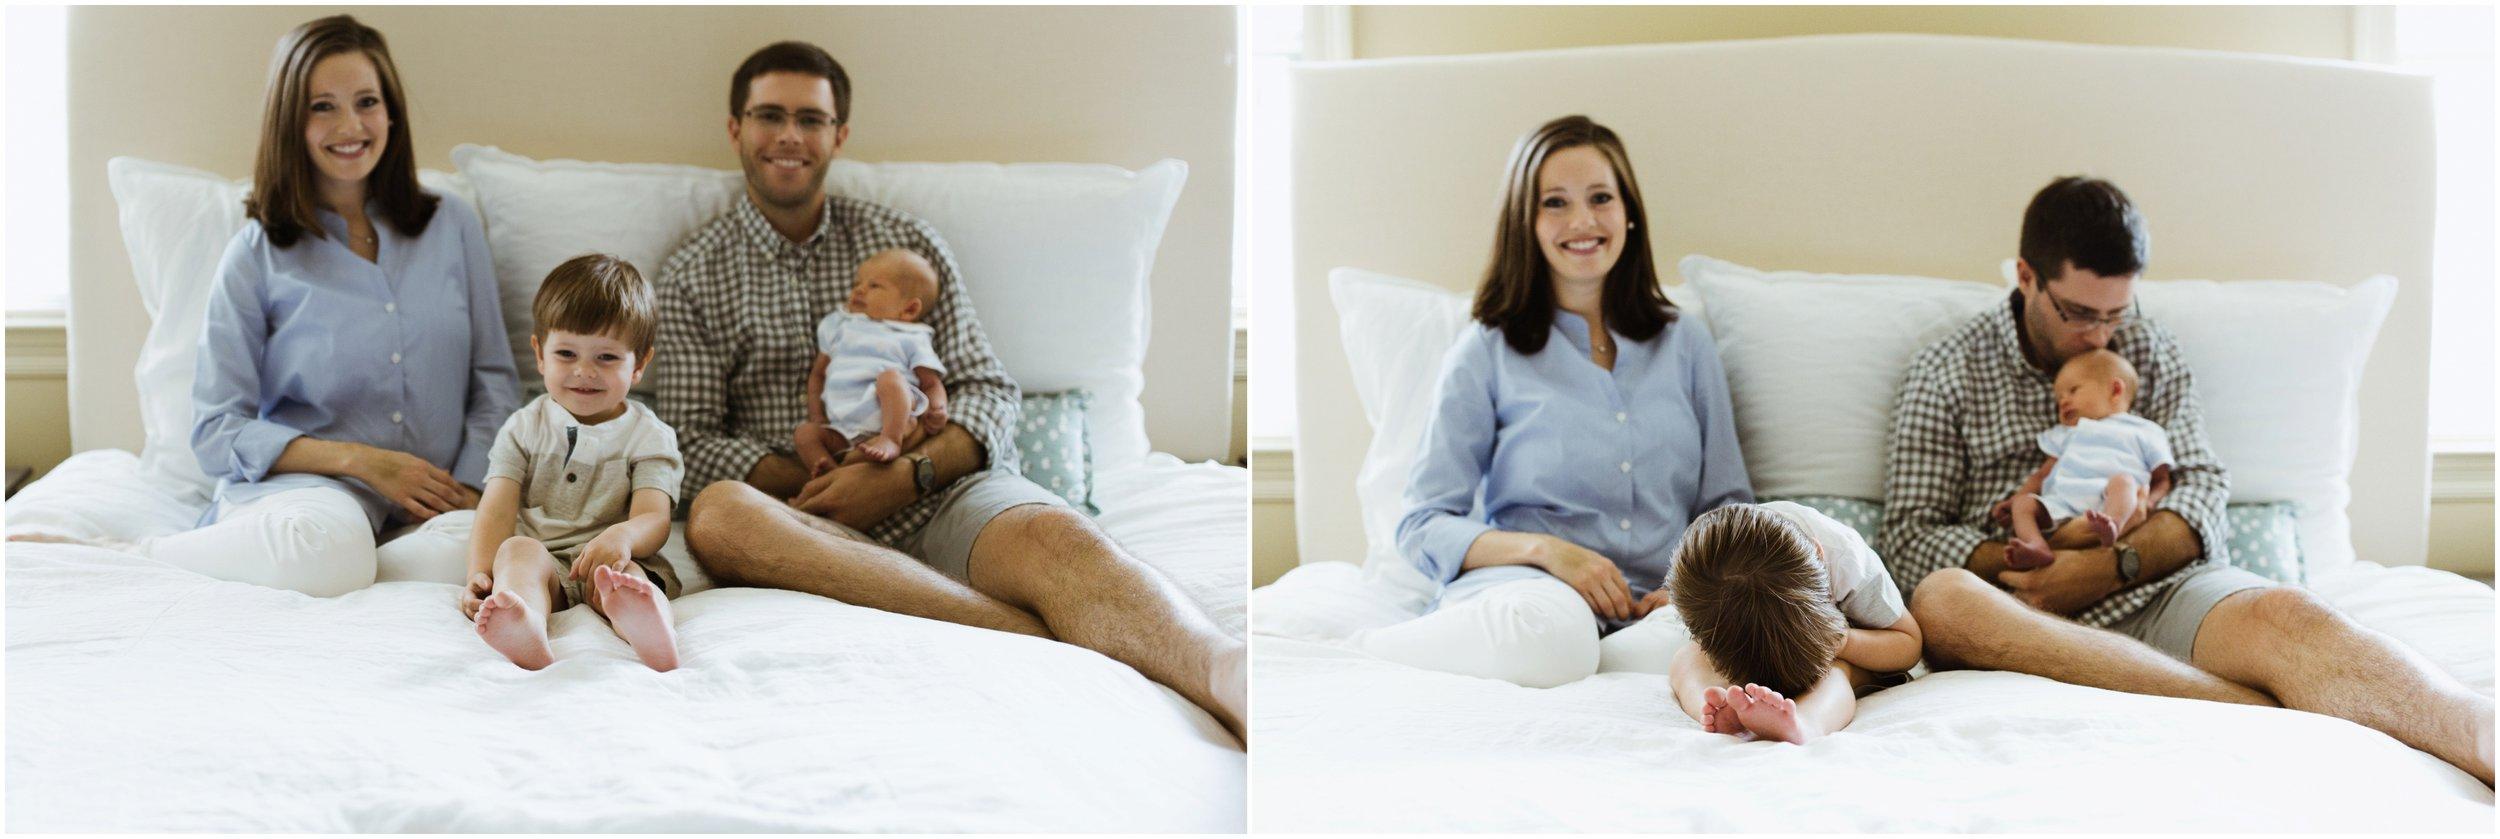 Aldrige-Family-2017-August-042_quaint-and-whim-lifestyle-newborn-photographer-louisiana-aldrige-family-.jpg